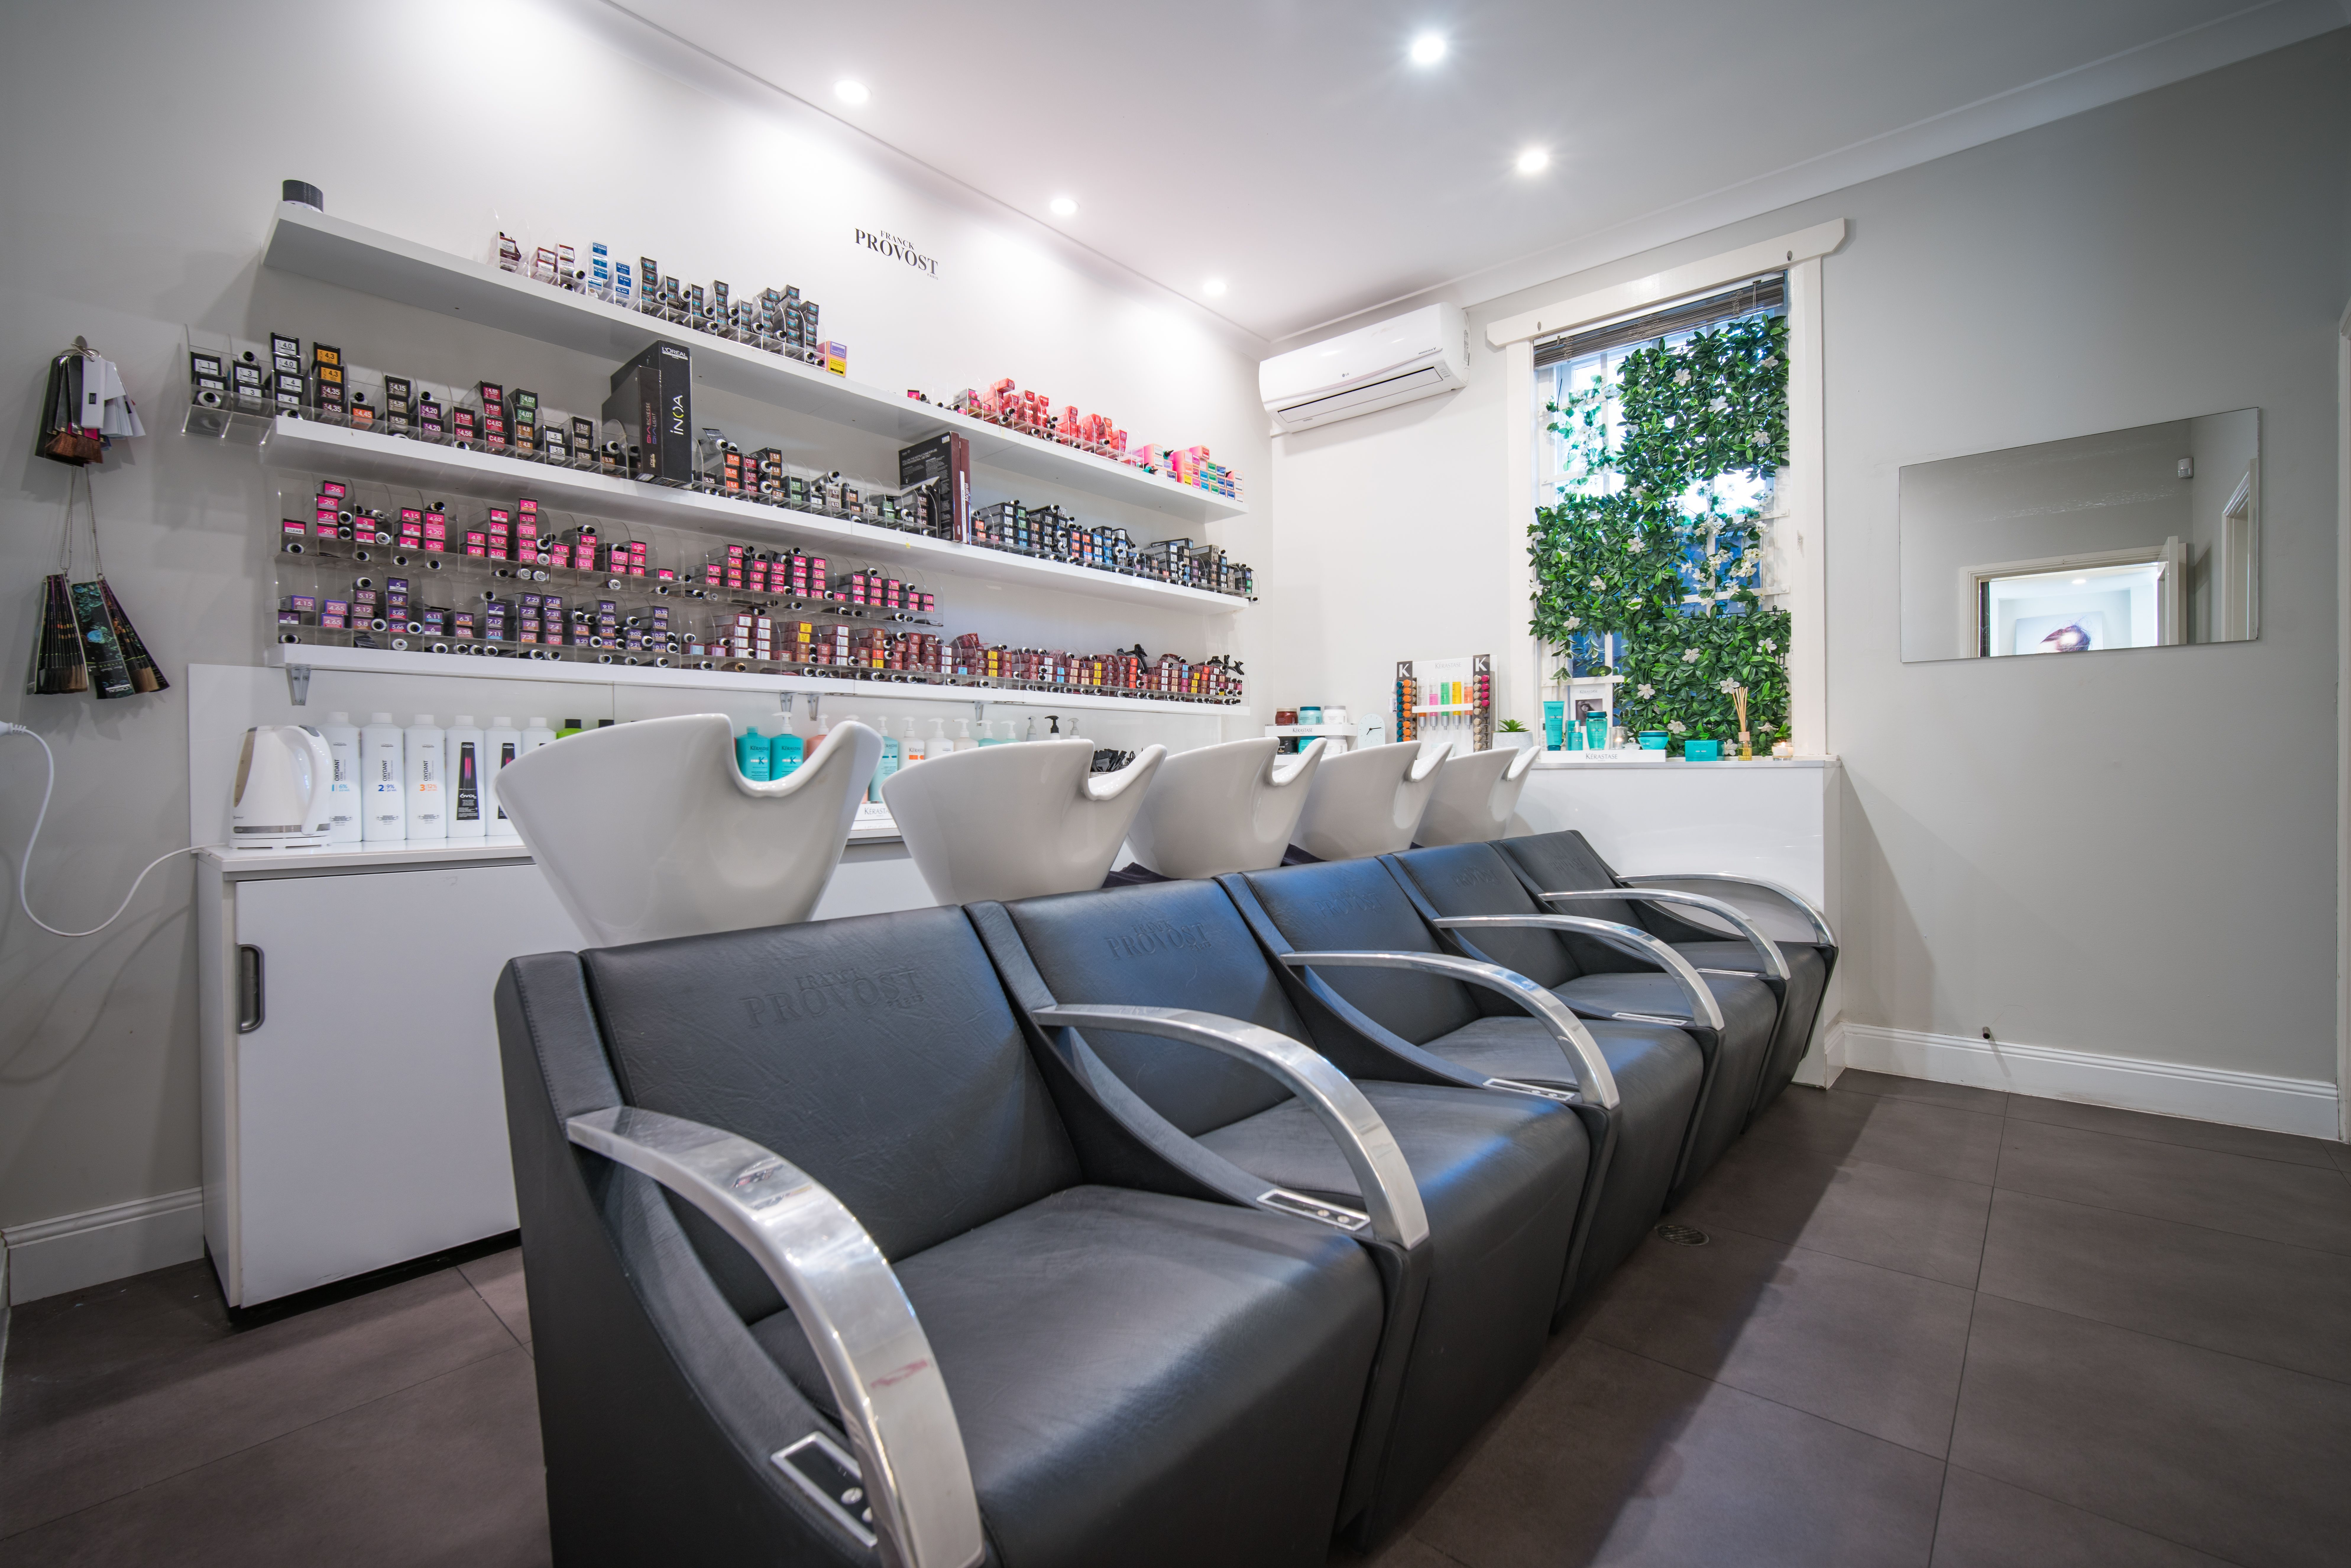 Franckprovost Franckprovostparis Franckprovostaustralia Sydney Australia Hairsalons Salons Beauty Haircare Hairgo Star Salon Minimalist Design Design